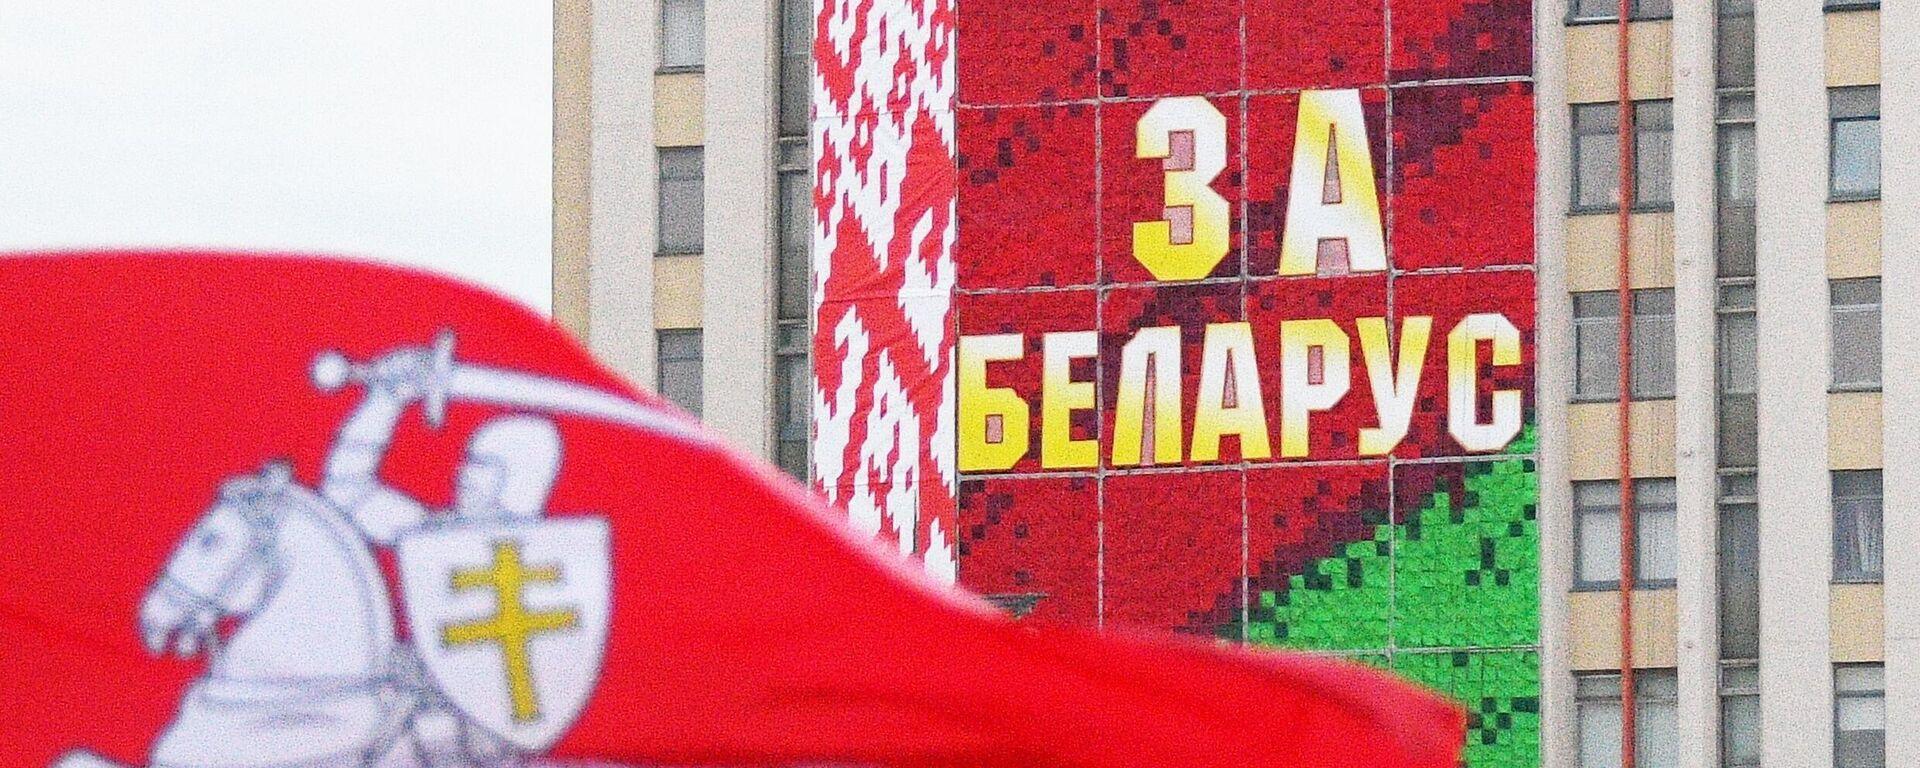 Акции протеста в Минске - Sputnik Ўзбекистон, 1920, 01.06.2021